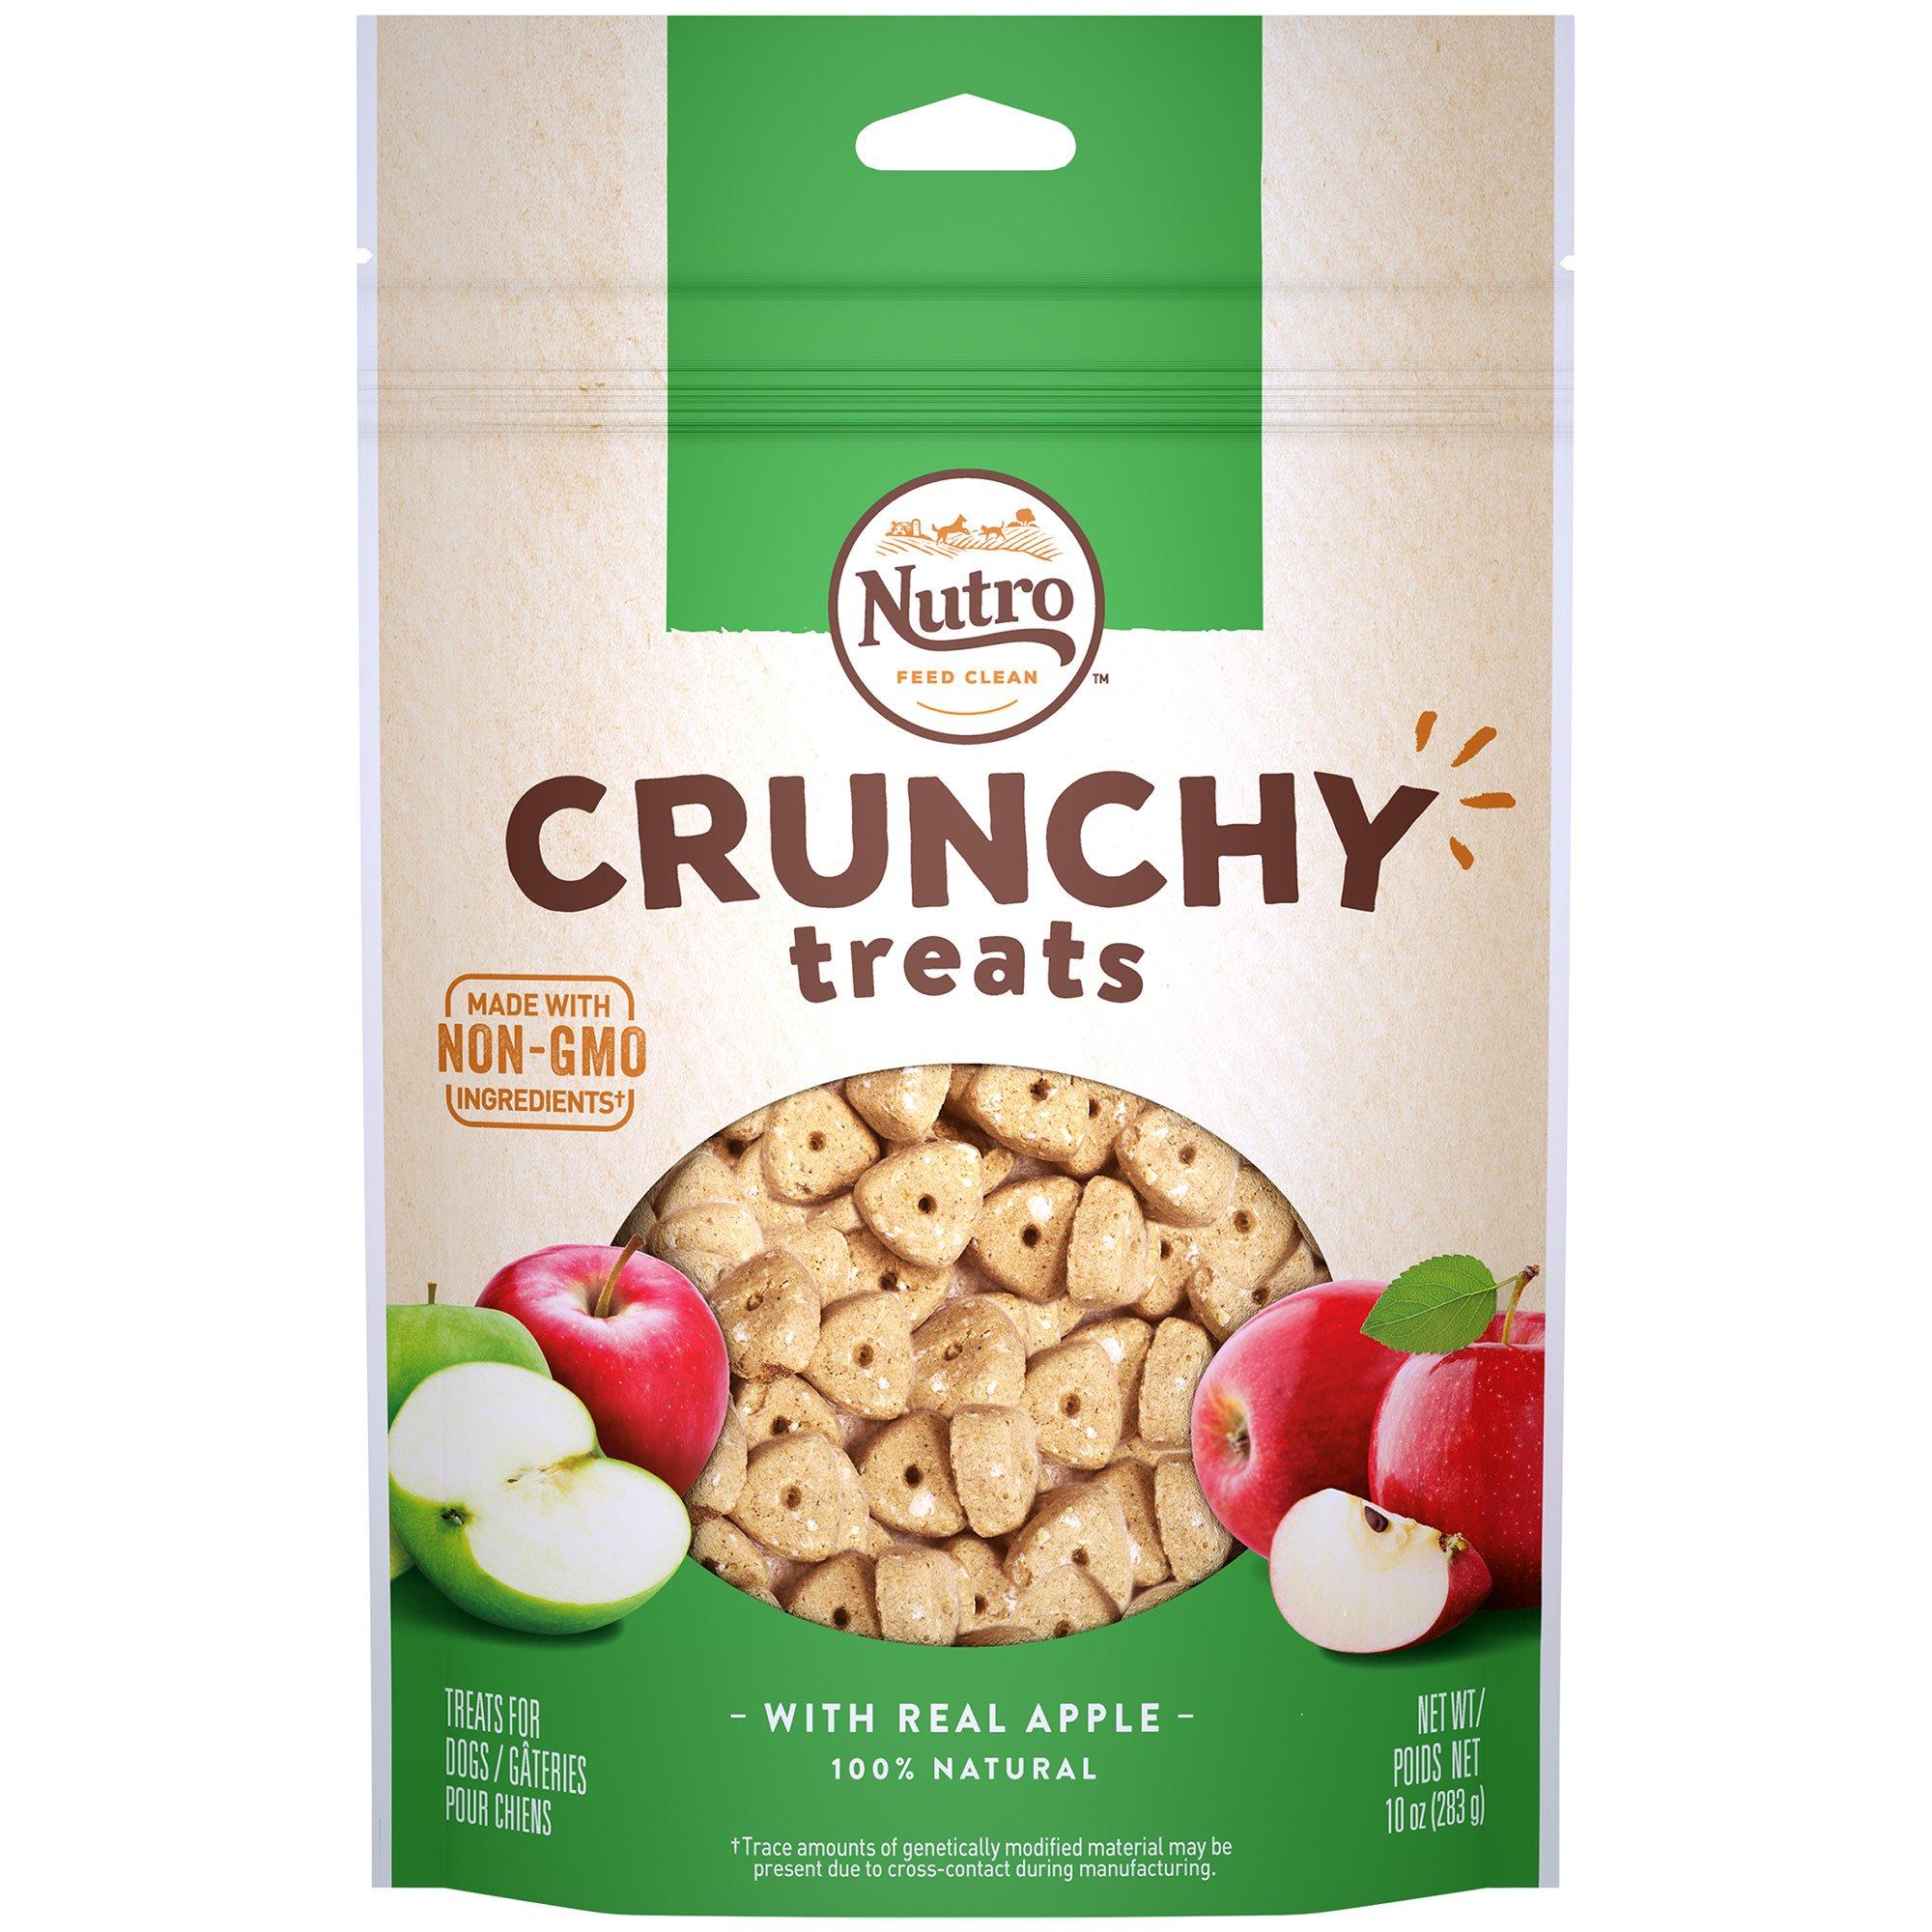 Nutro Dog Food Recall